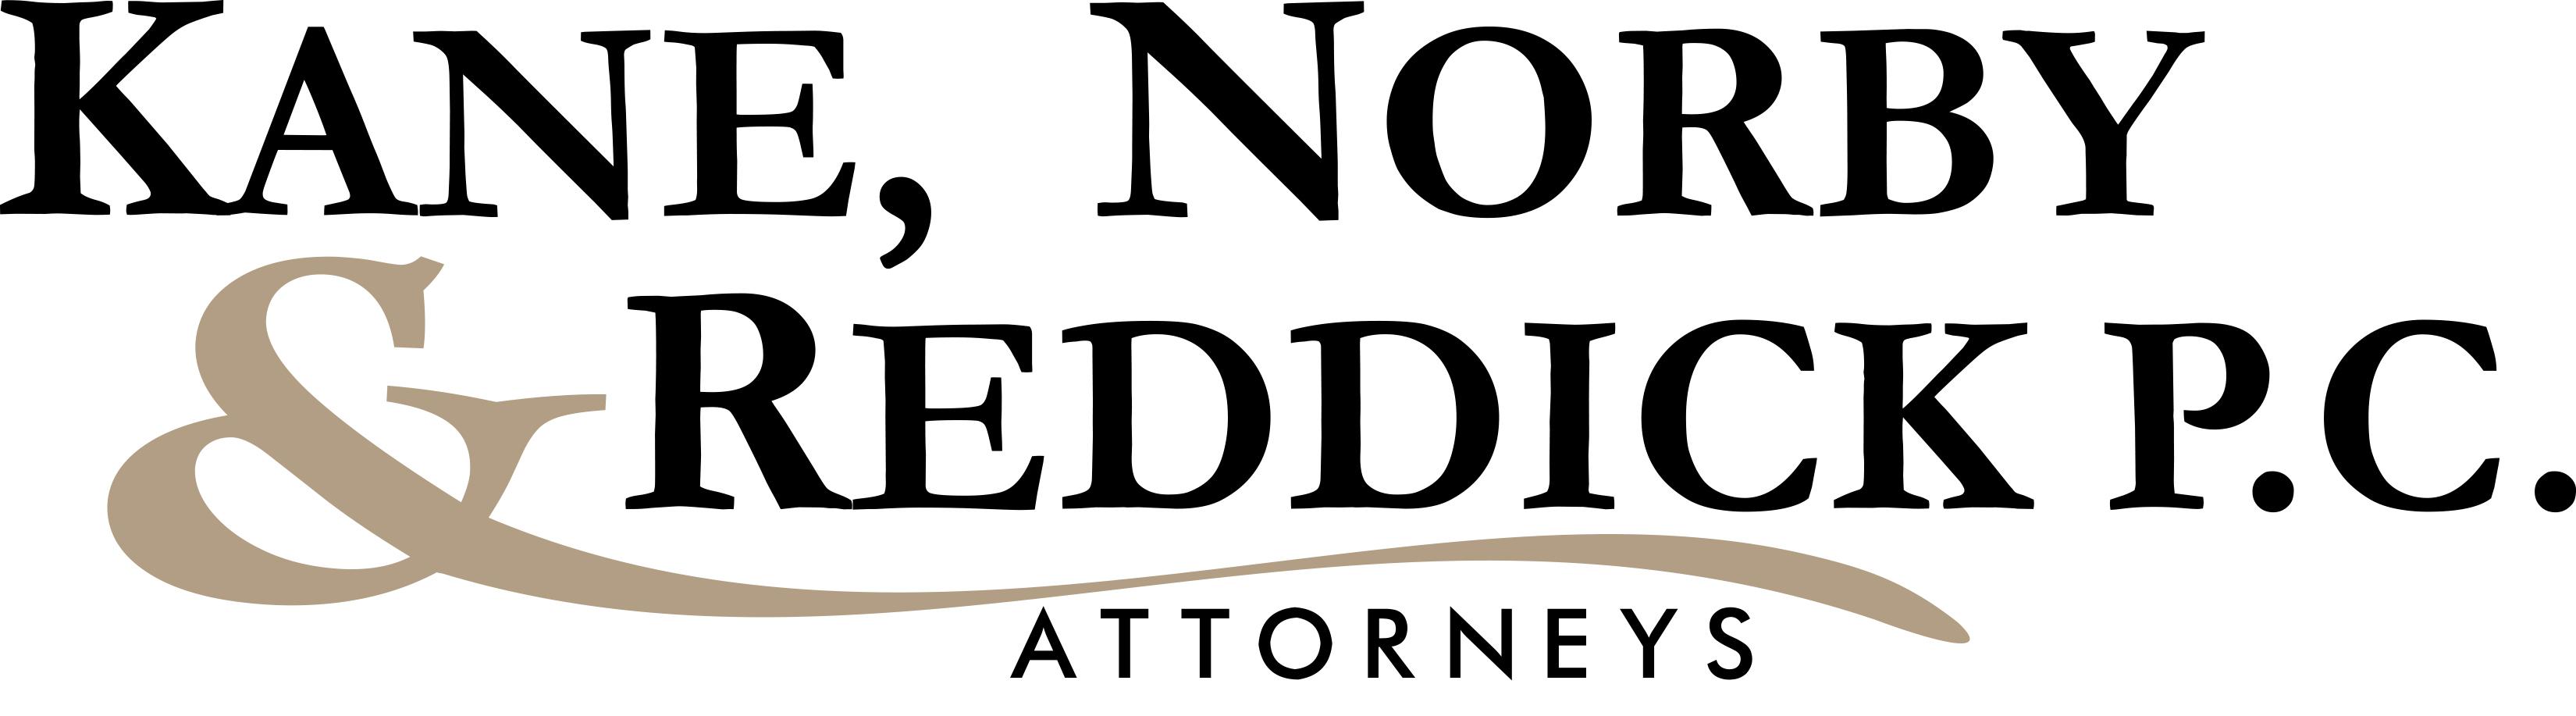 Kane Norby Reddick Logo